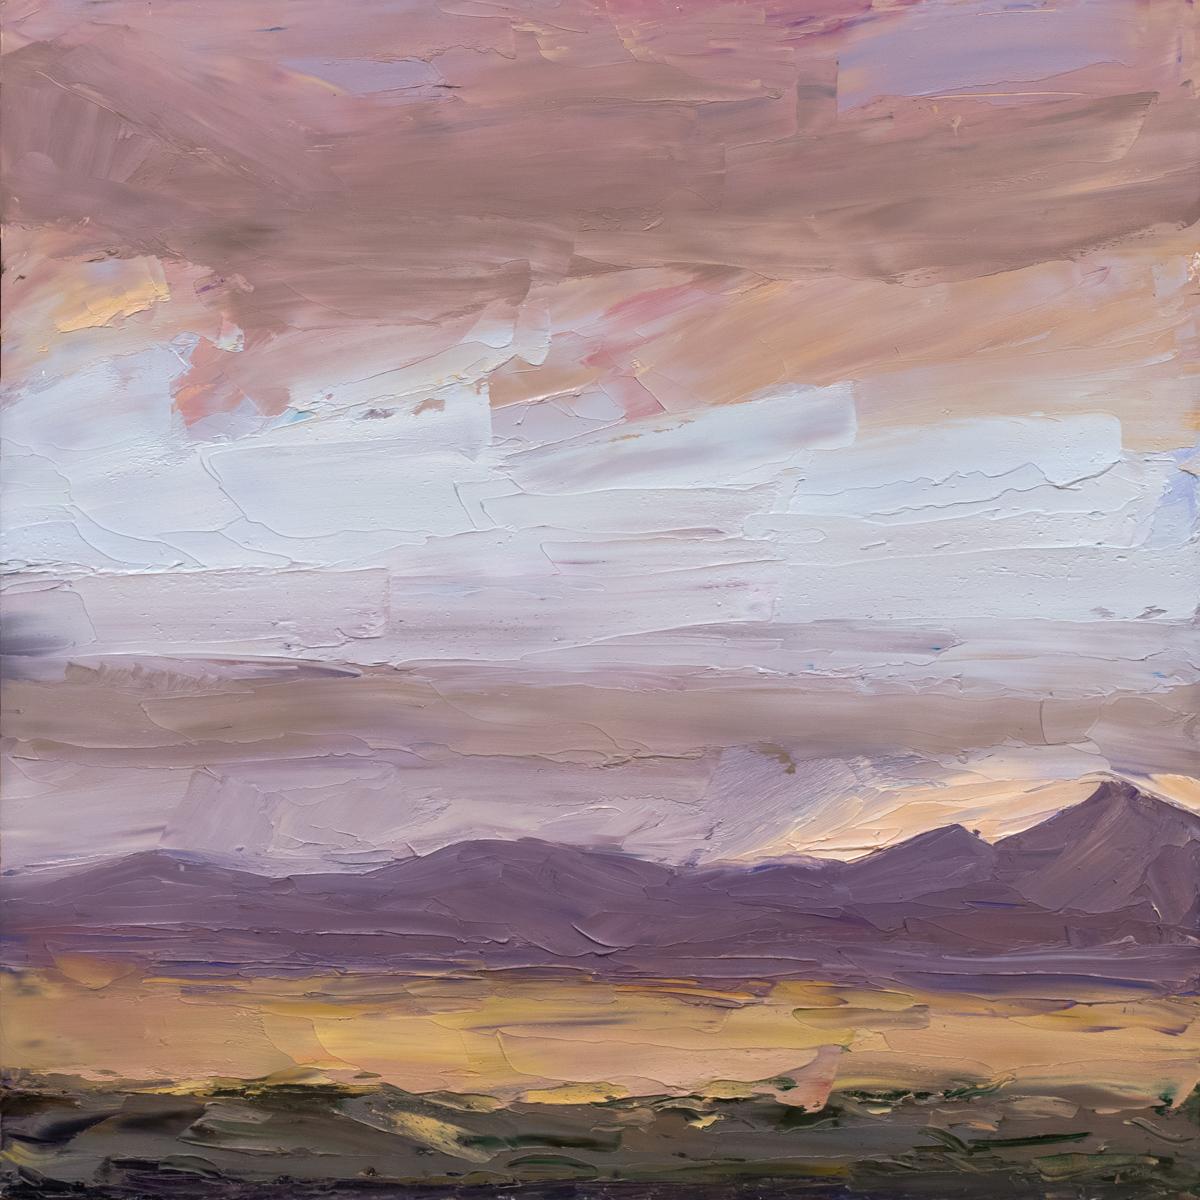 Stormy ridge #1